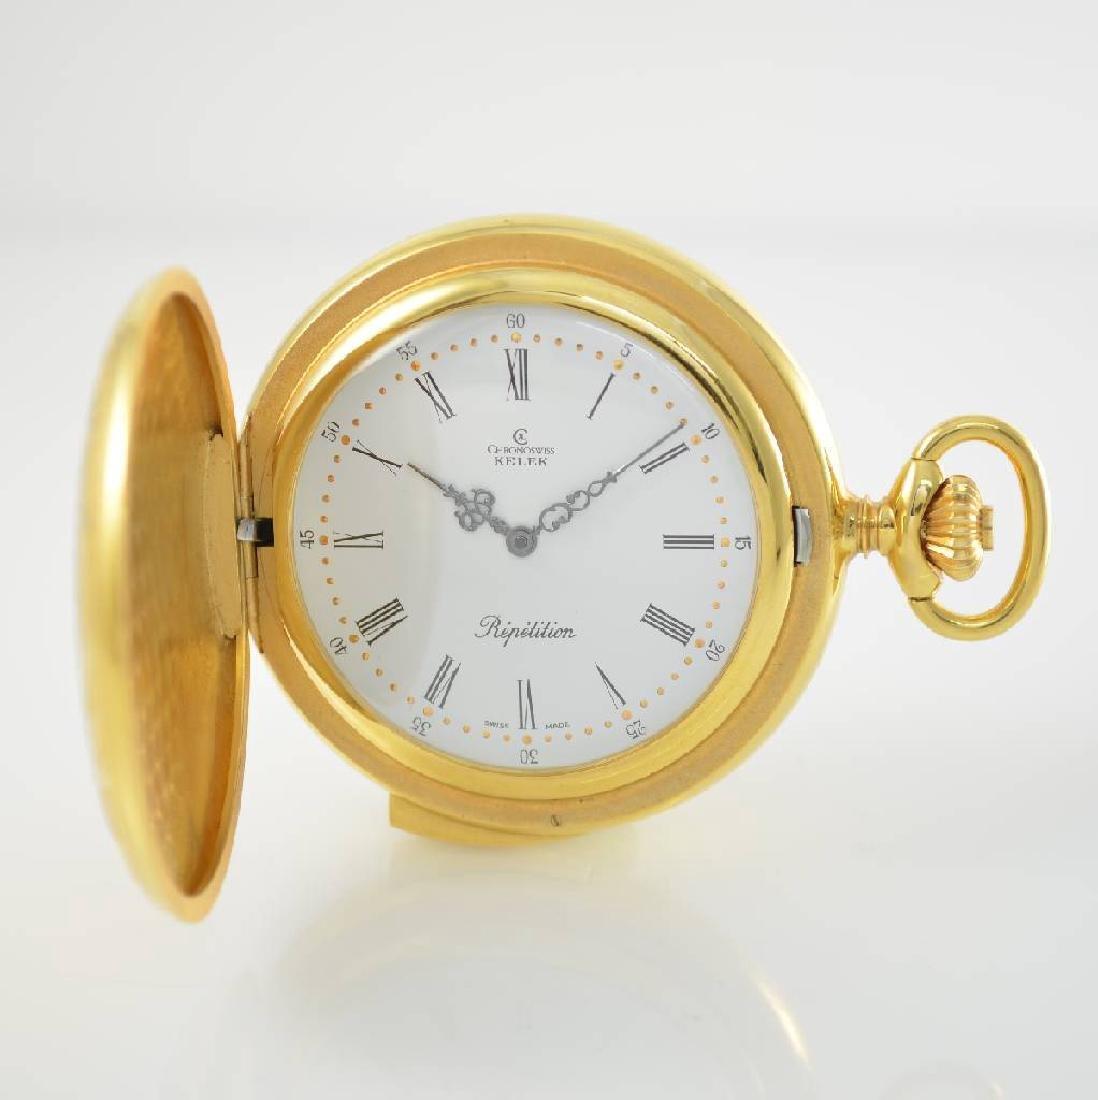 CHRONOSWISS Kelek pocket watch with repetition